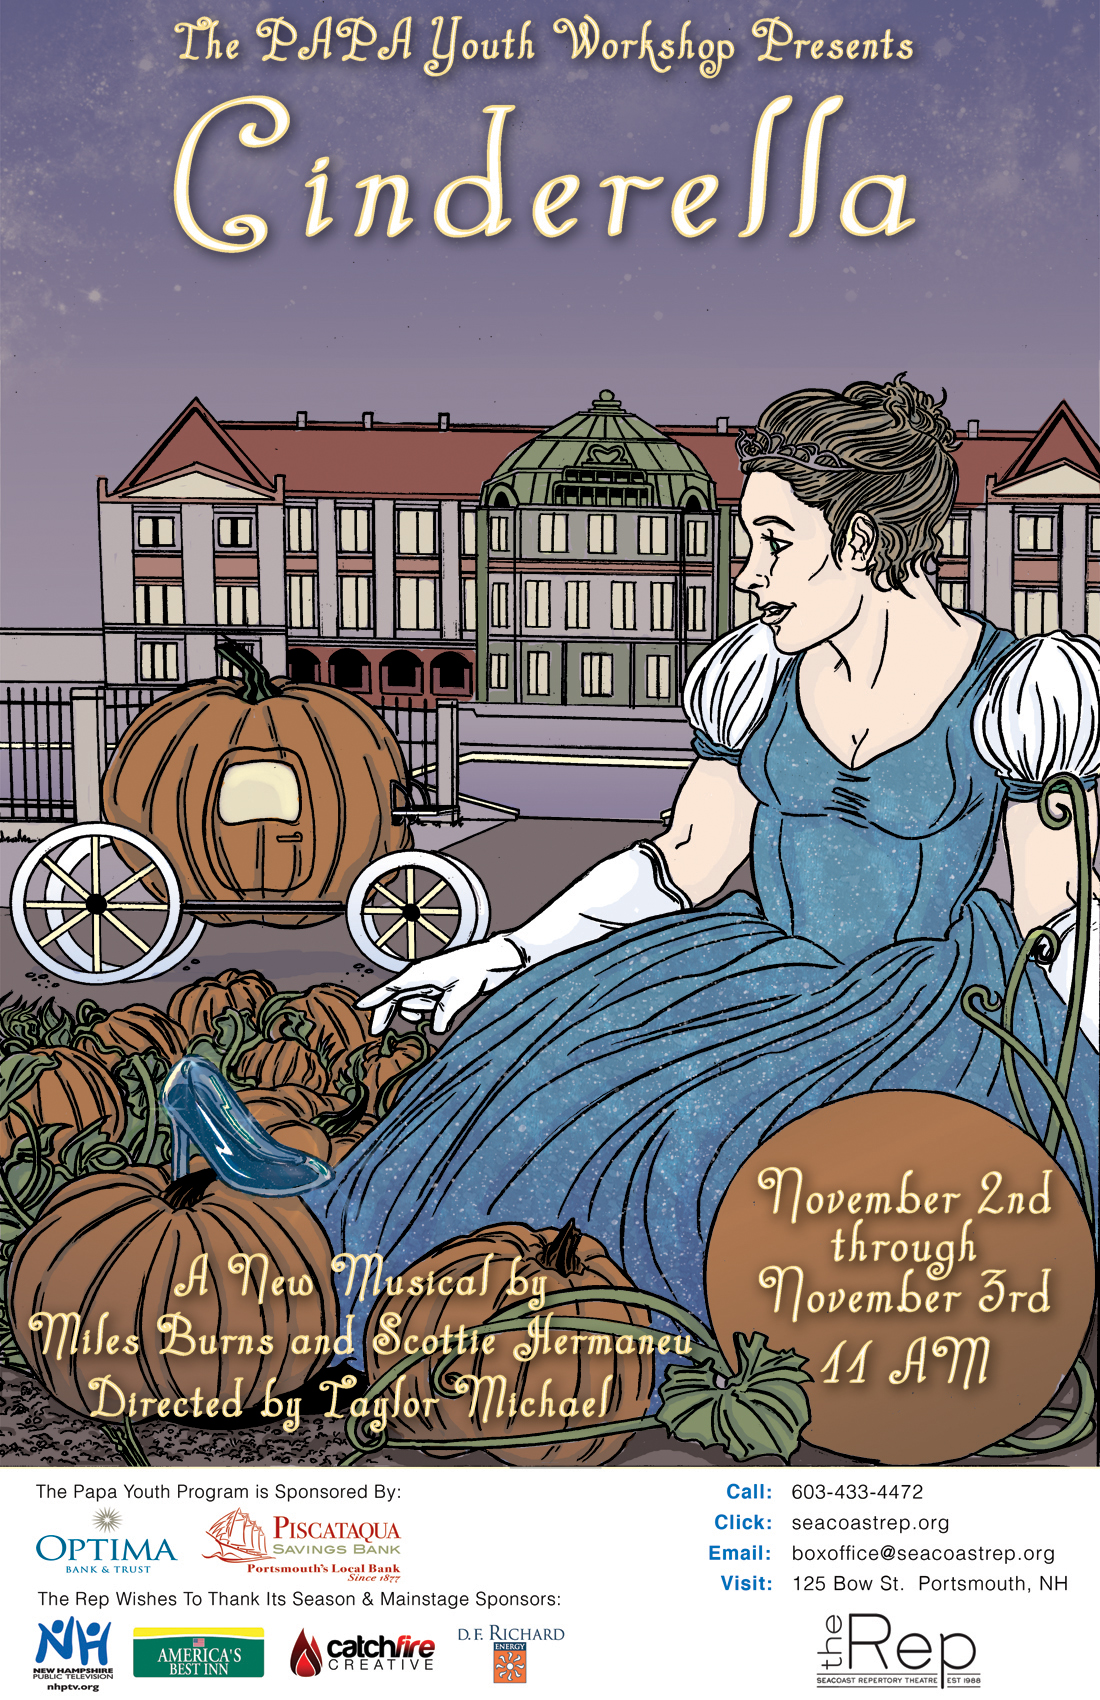 Cinderella Poster_Final_Web.jpg